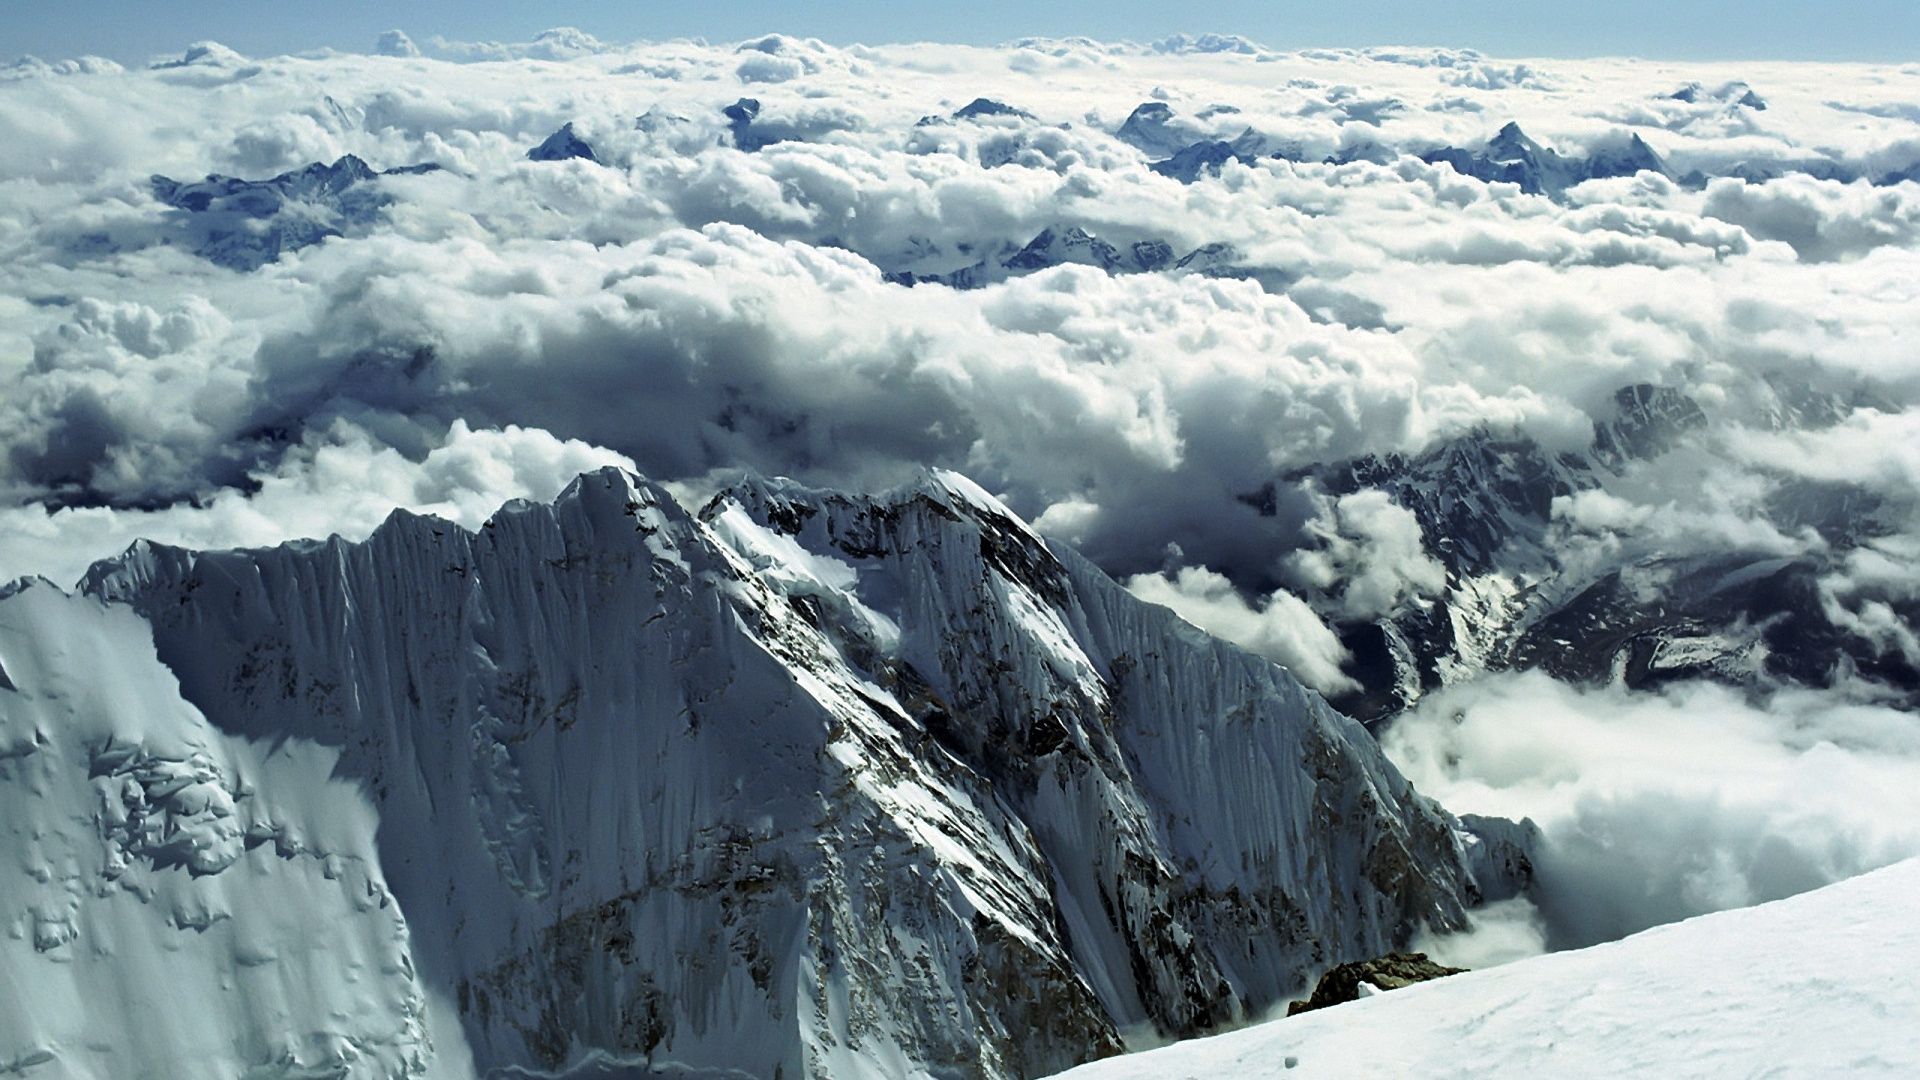 Best Wallpaper Mountain 1080p - c87fa6b0ca06c264d8626674d94fe783  Pictures_483533.jpg